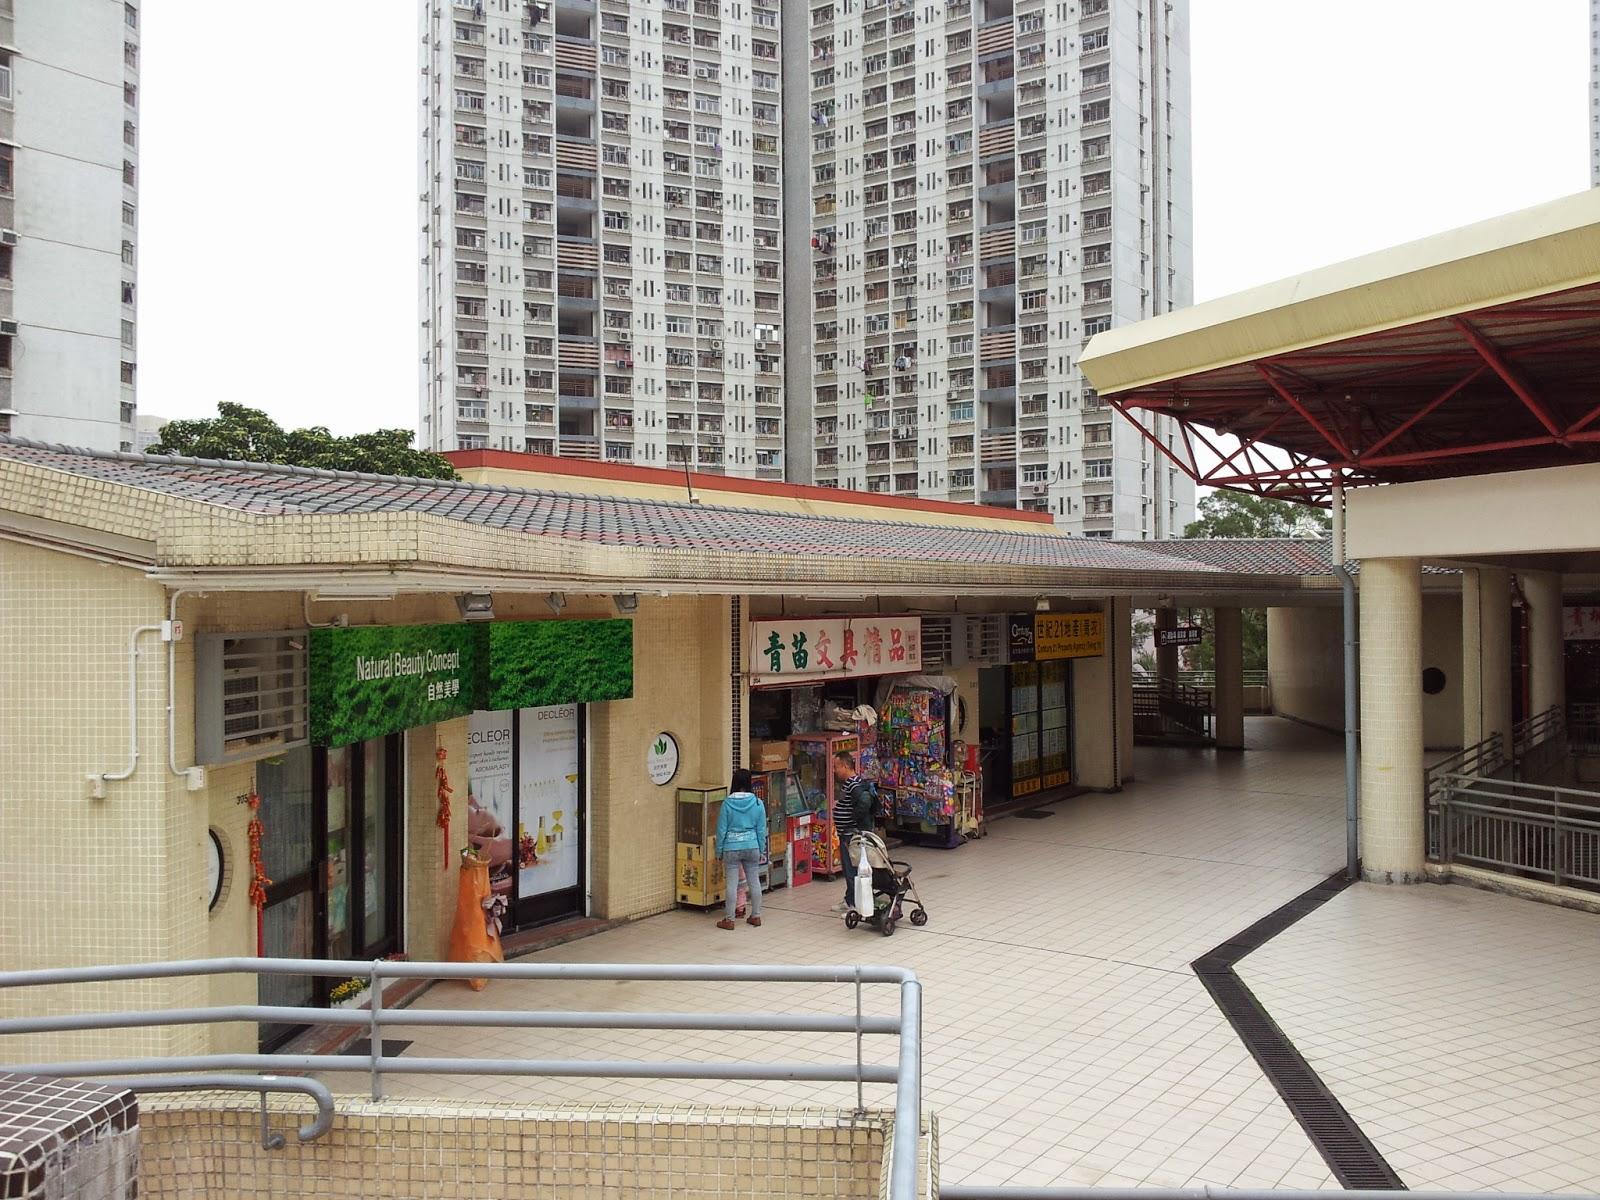 Grassroots O2: [領匯商場] 長康商場 @2015-03-07